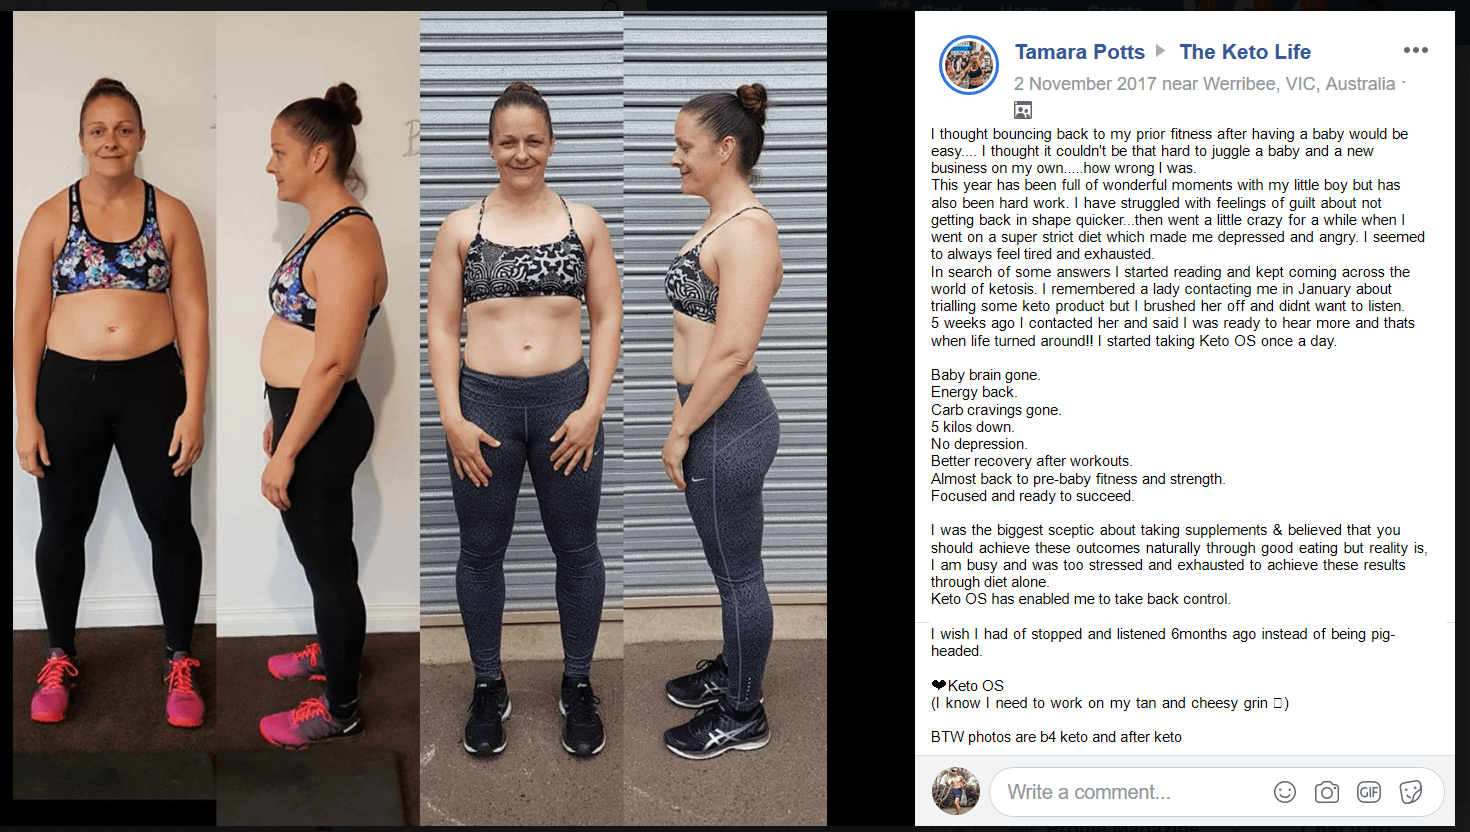 Fat Loss - Energy - Focus - Appetite Supression - Performance - Tamara Potts